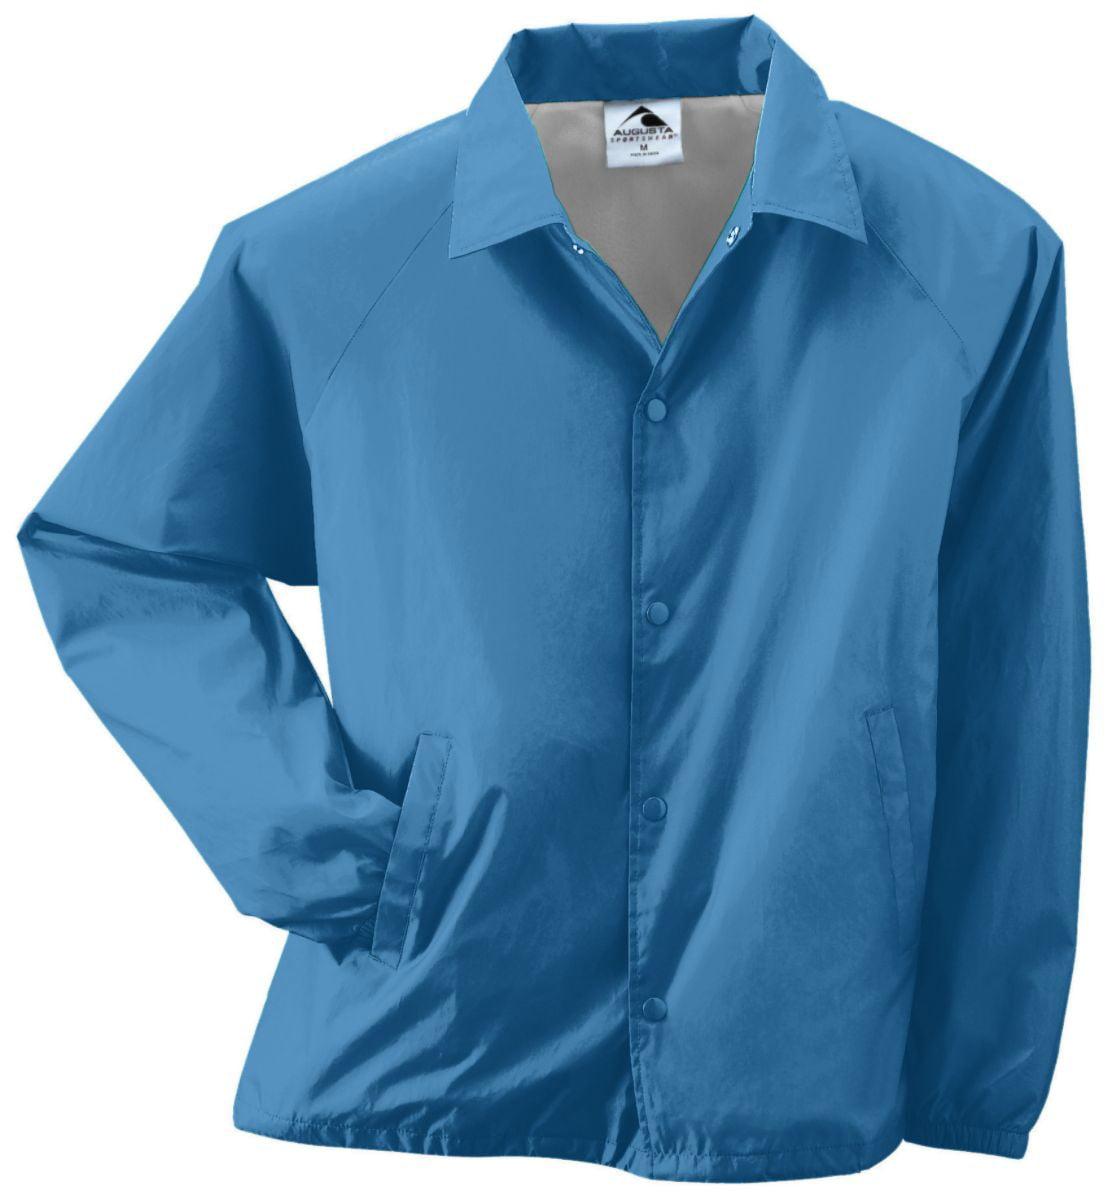 NYLON COACH'S JACKET/LINED COL BLUE XL